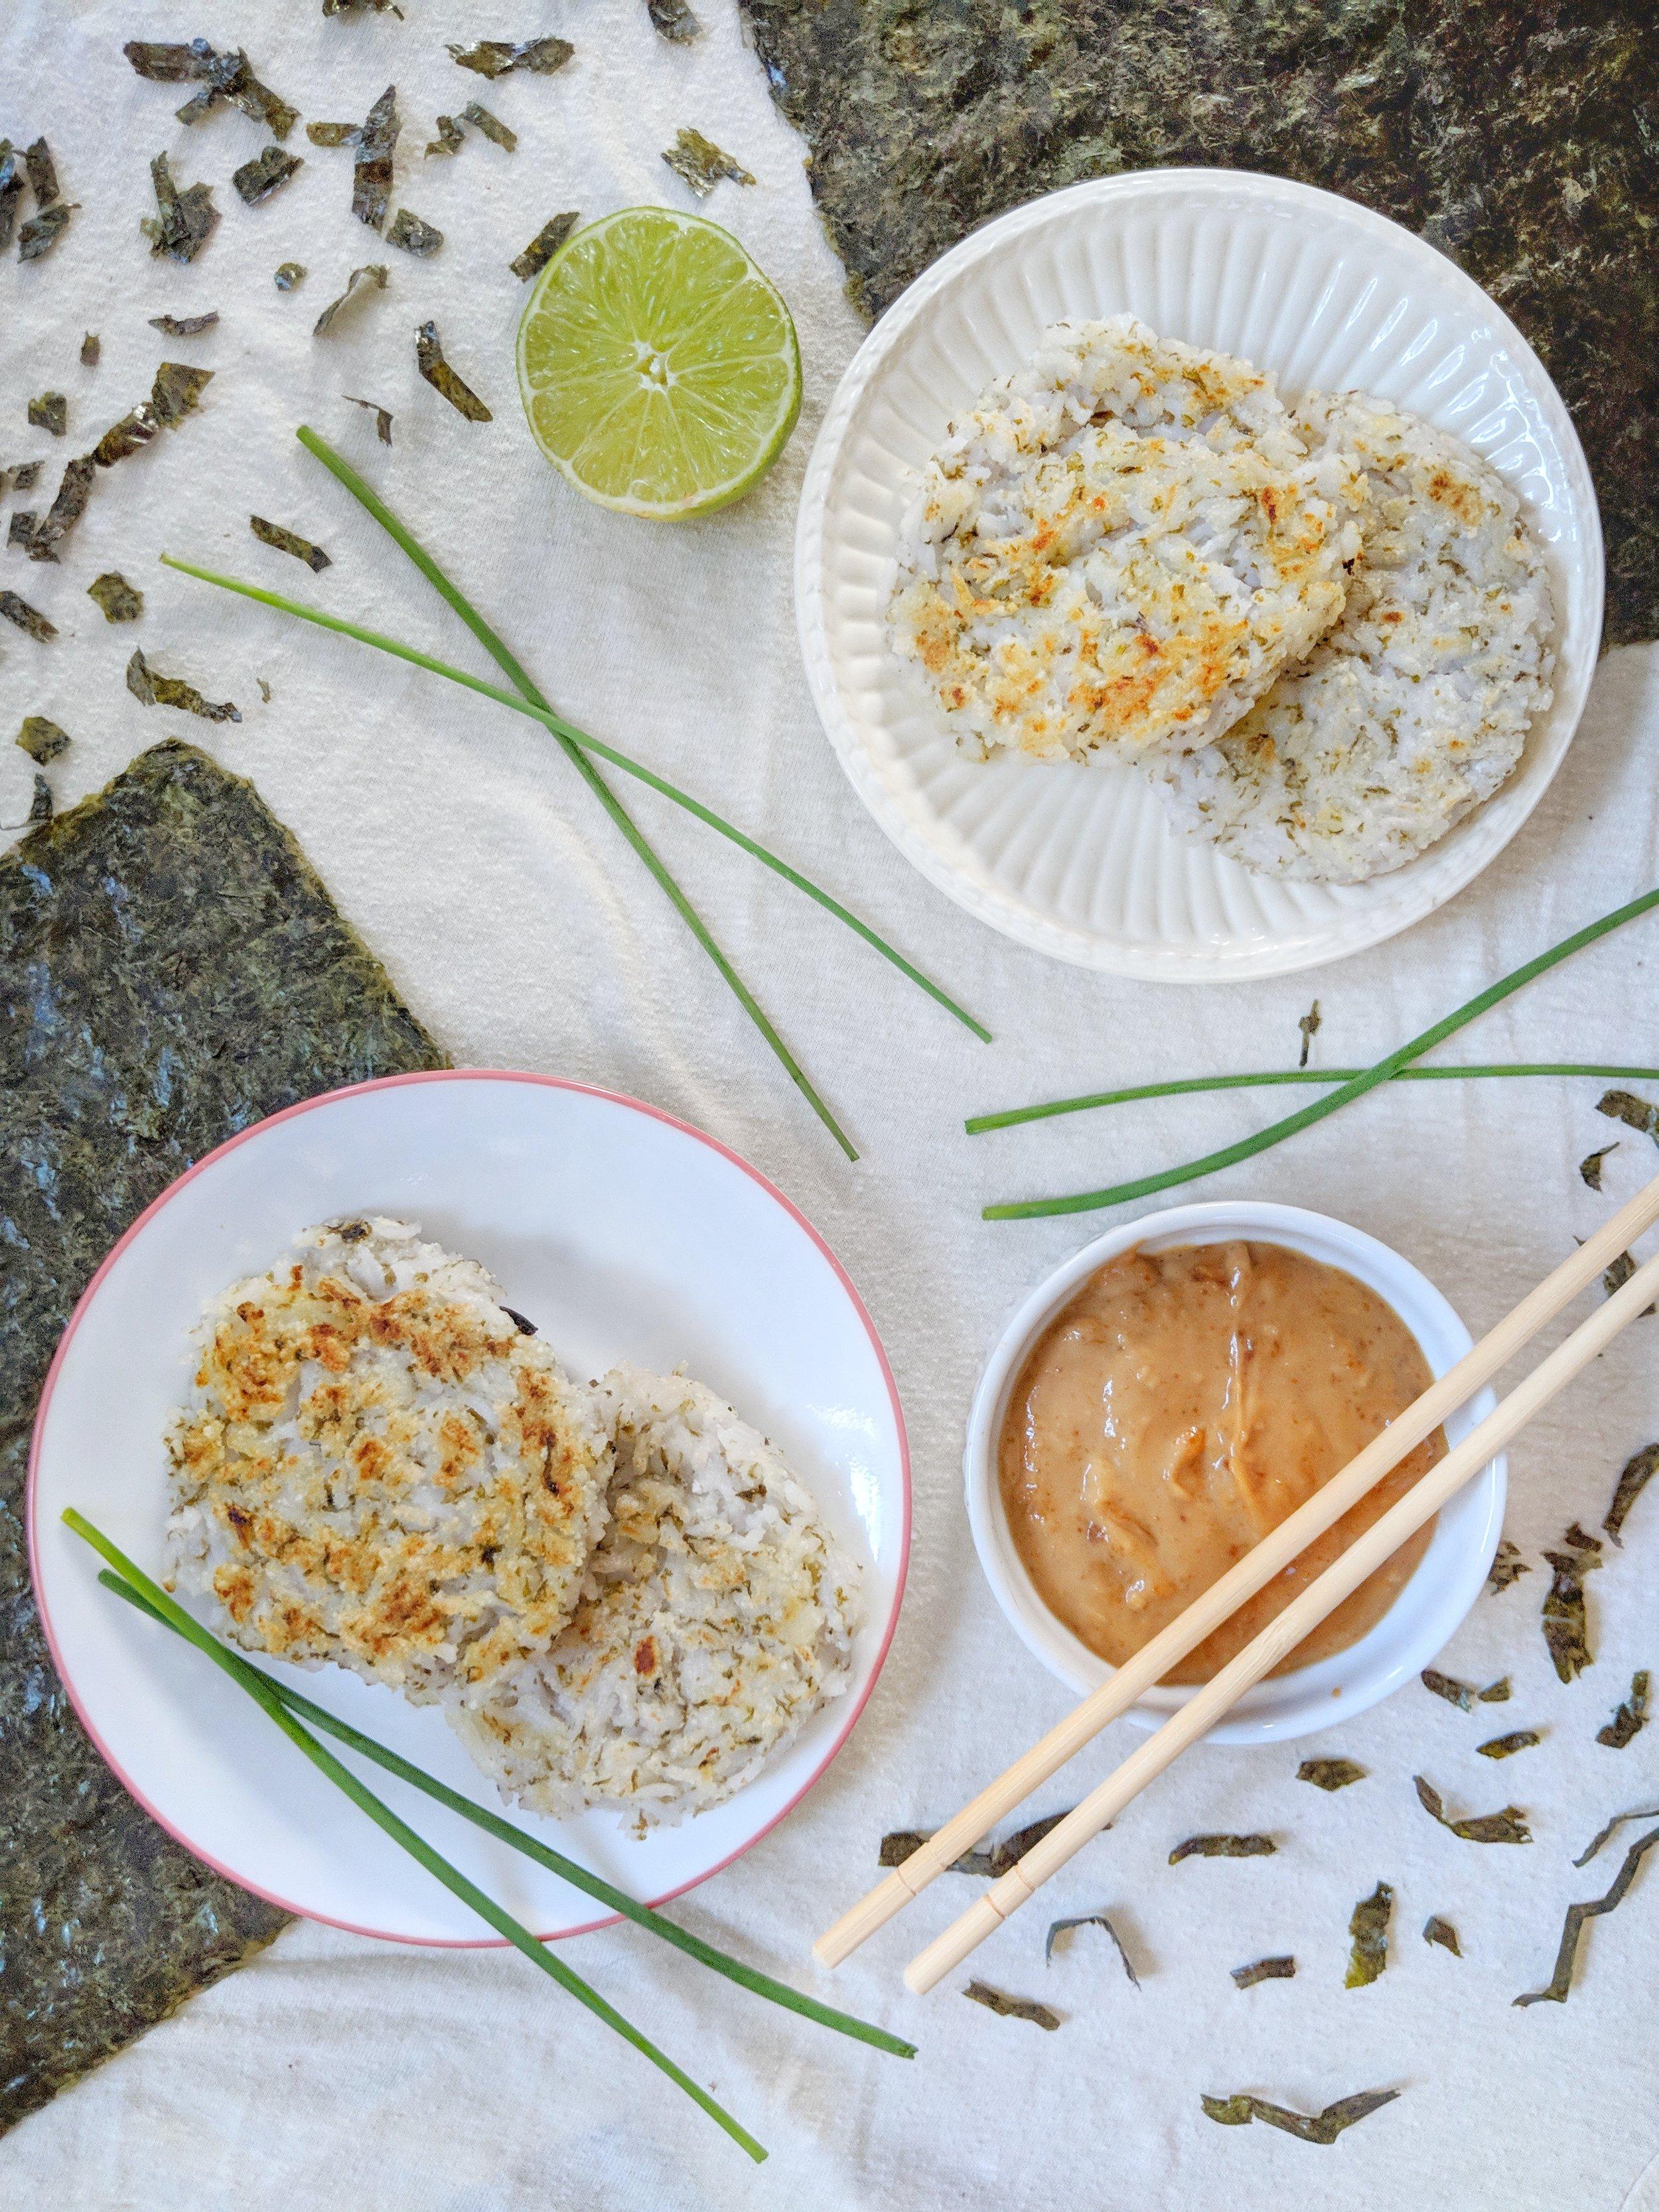 Seaweed Rice Cakes with Peanut Sauce